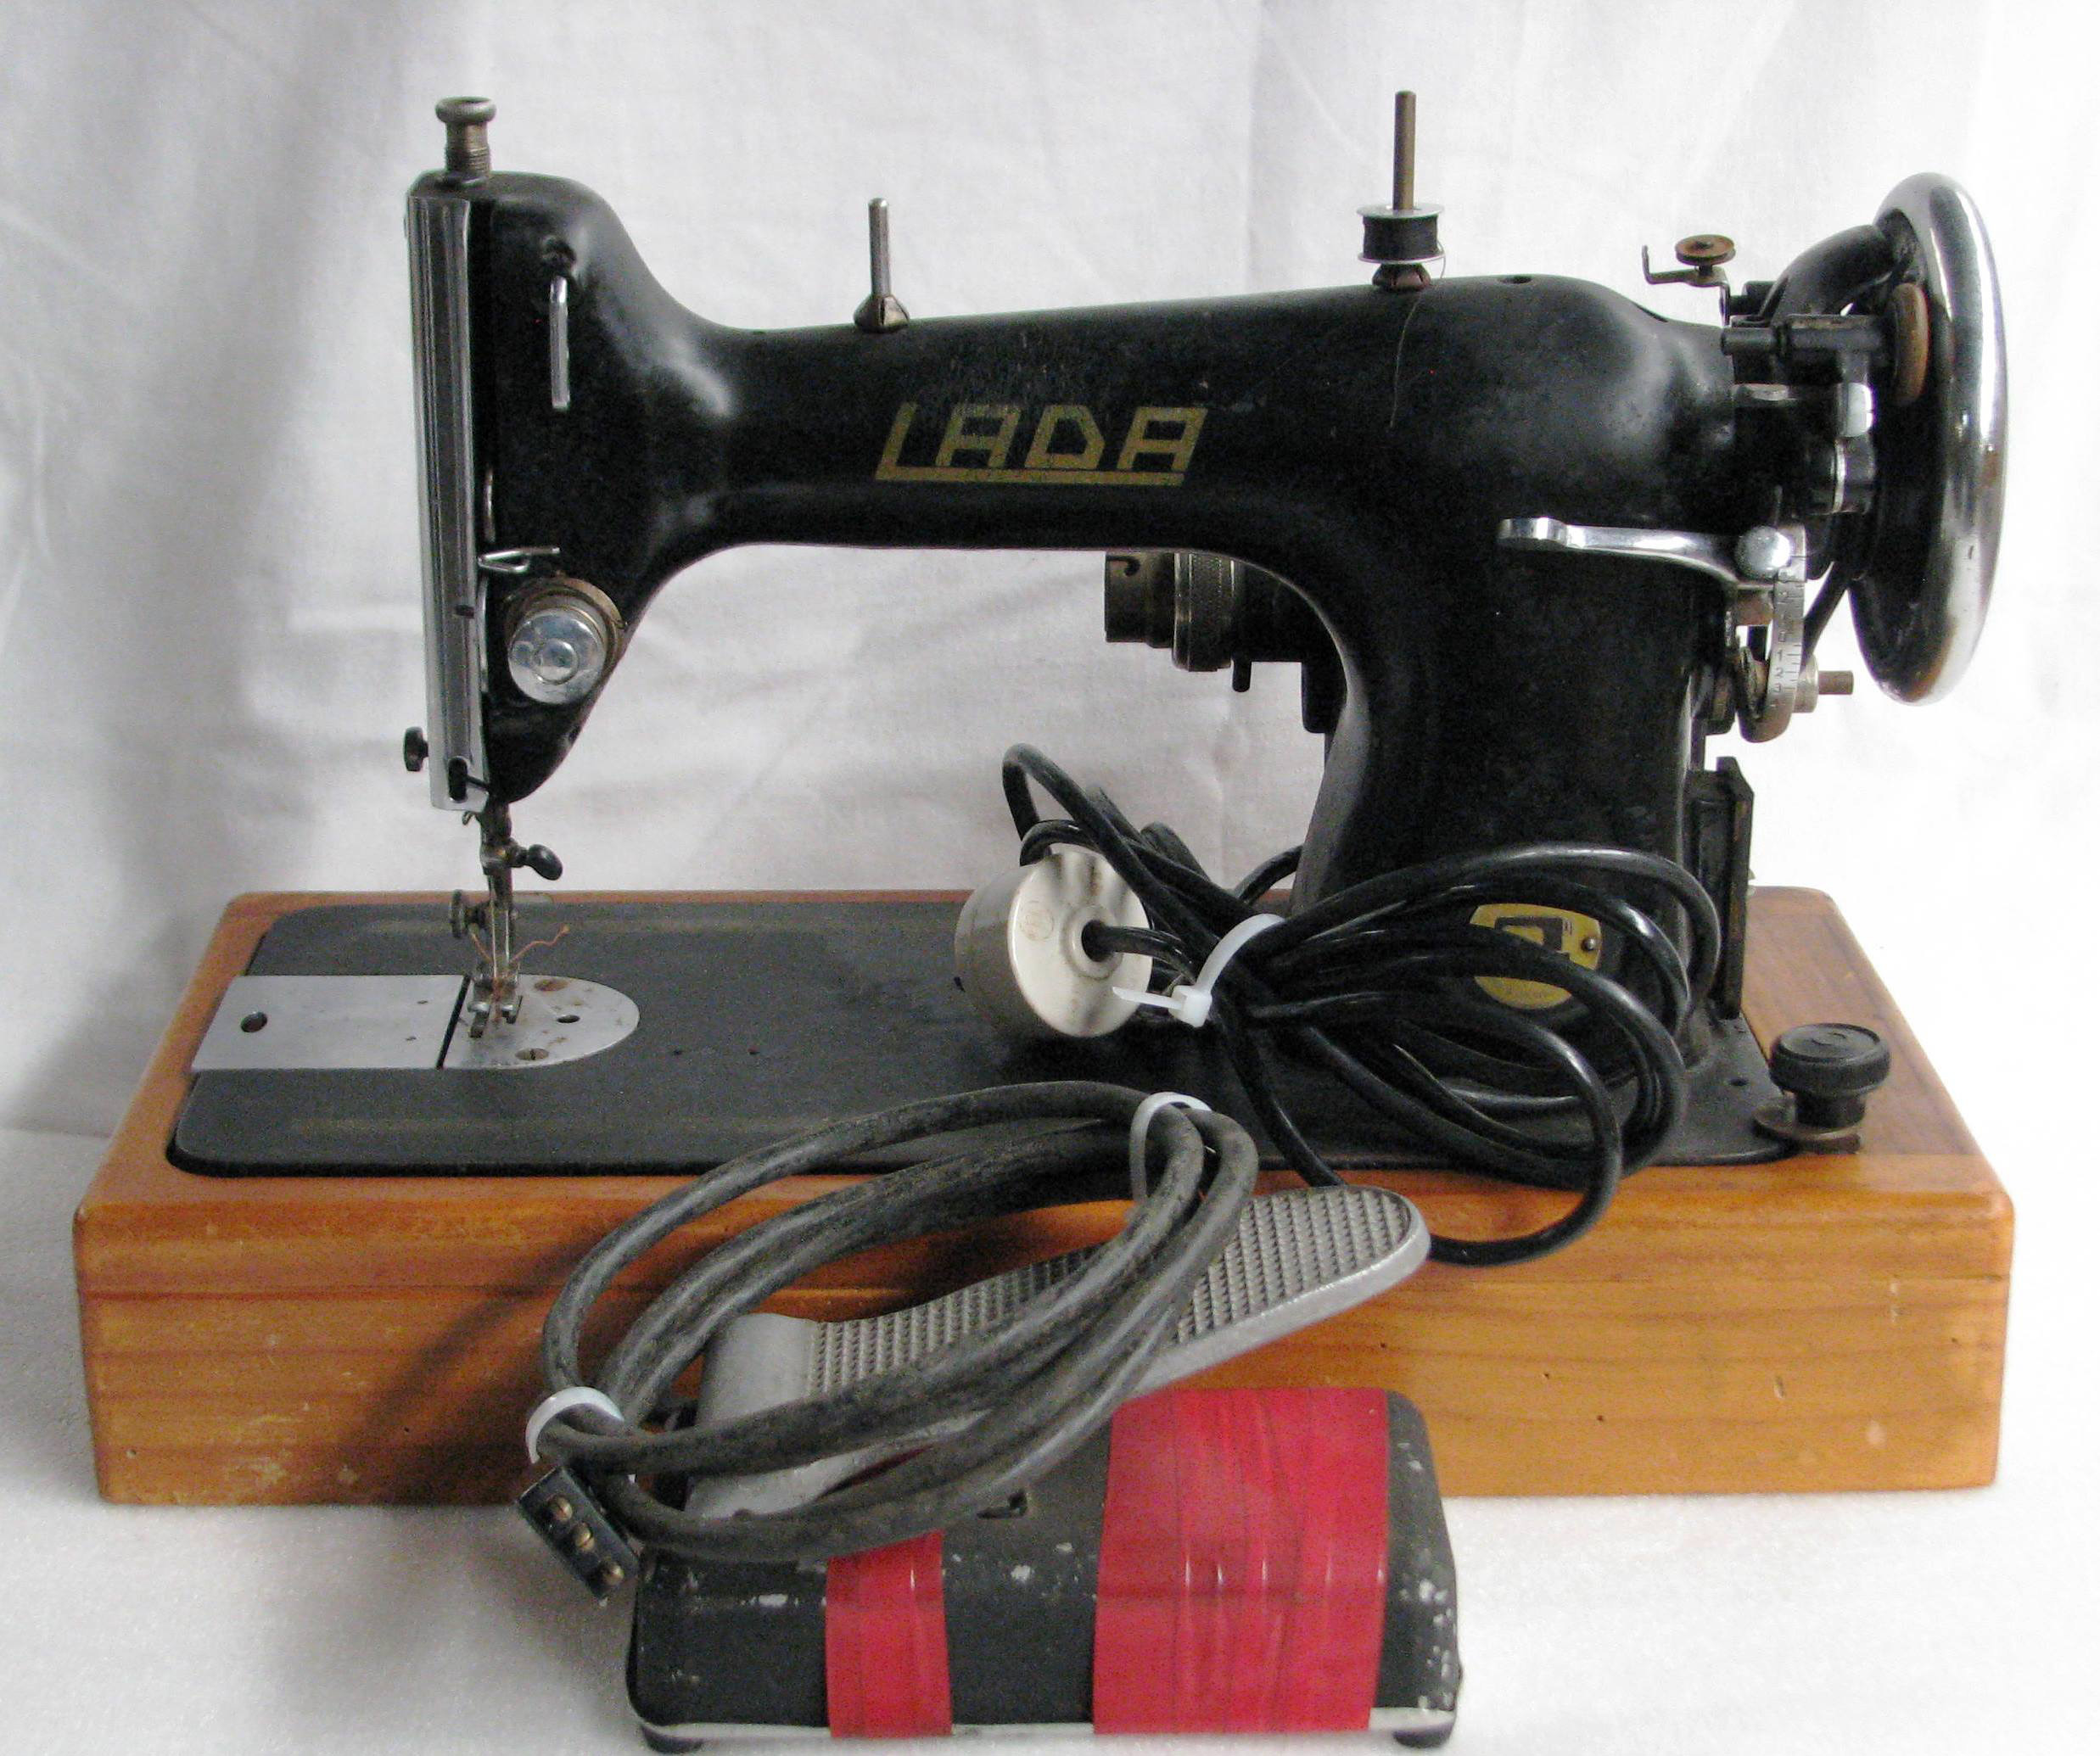 121 Needlelite sewing machine